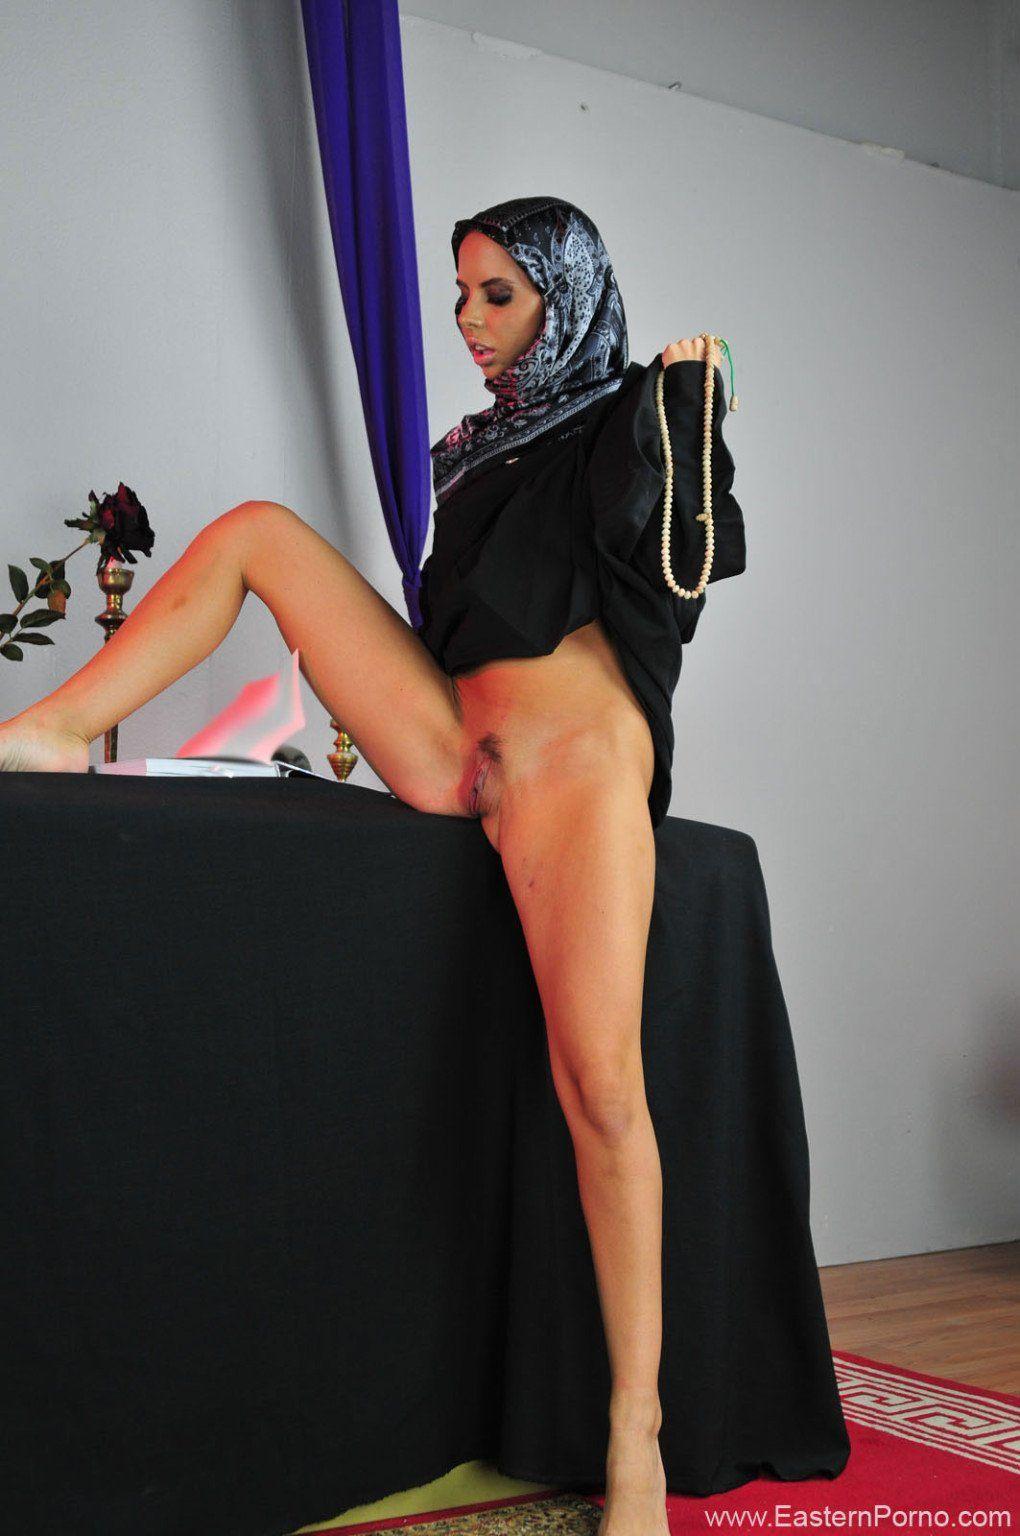 Muslim porn pics gallery